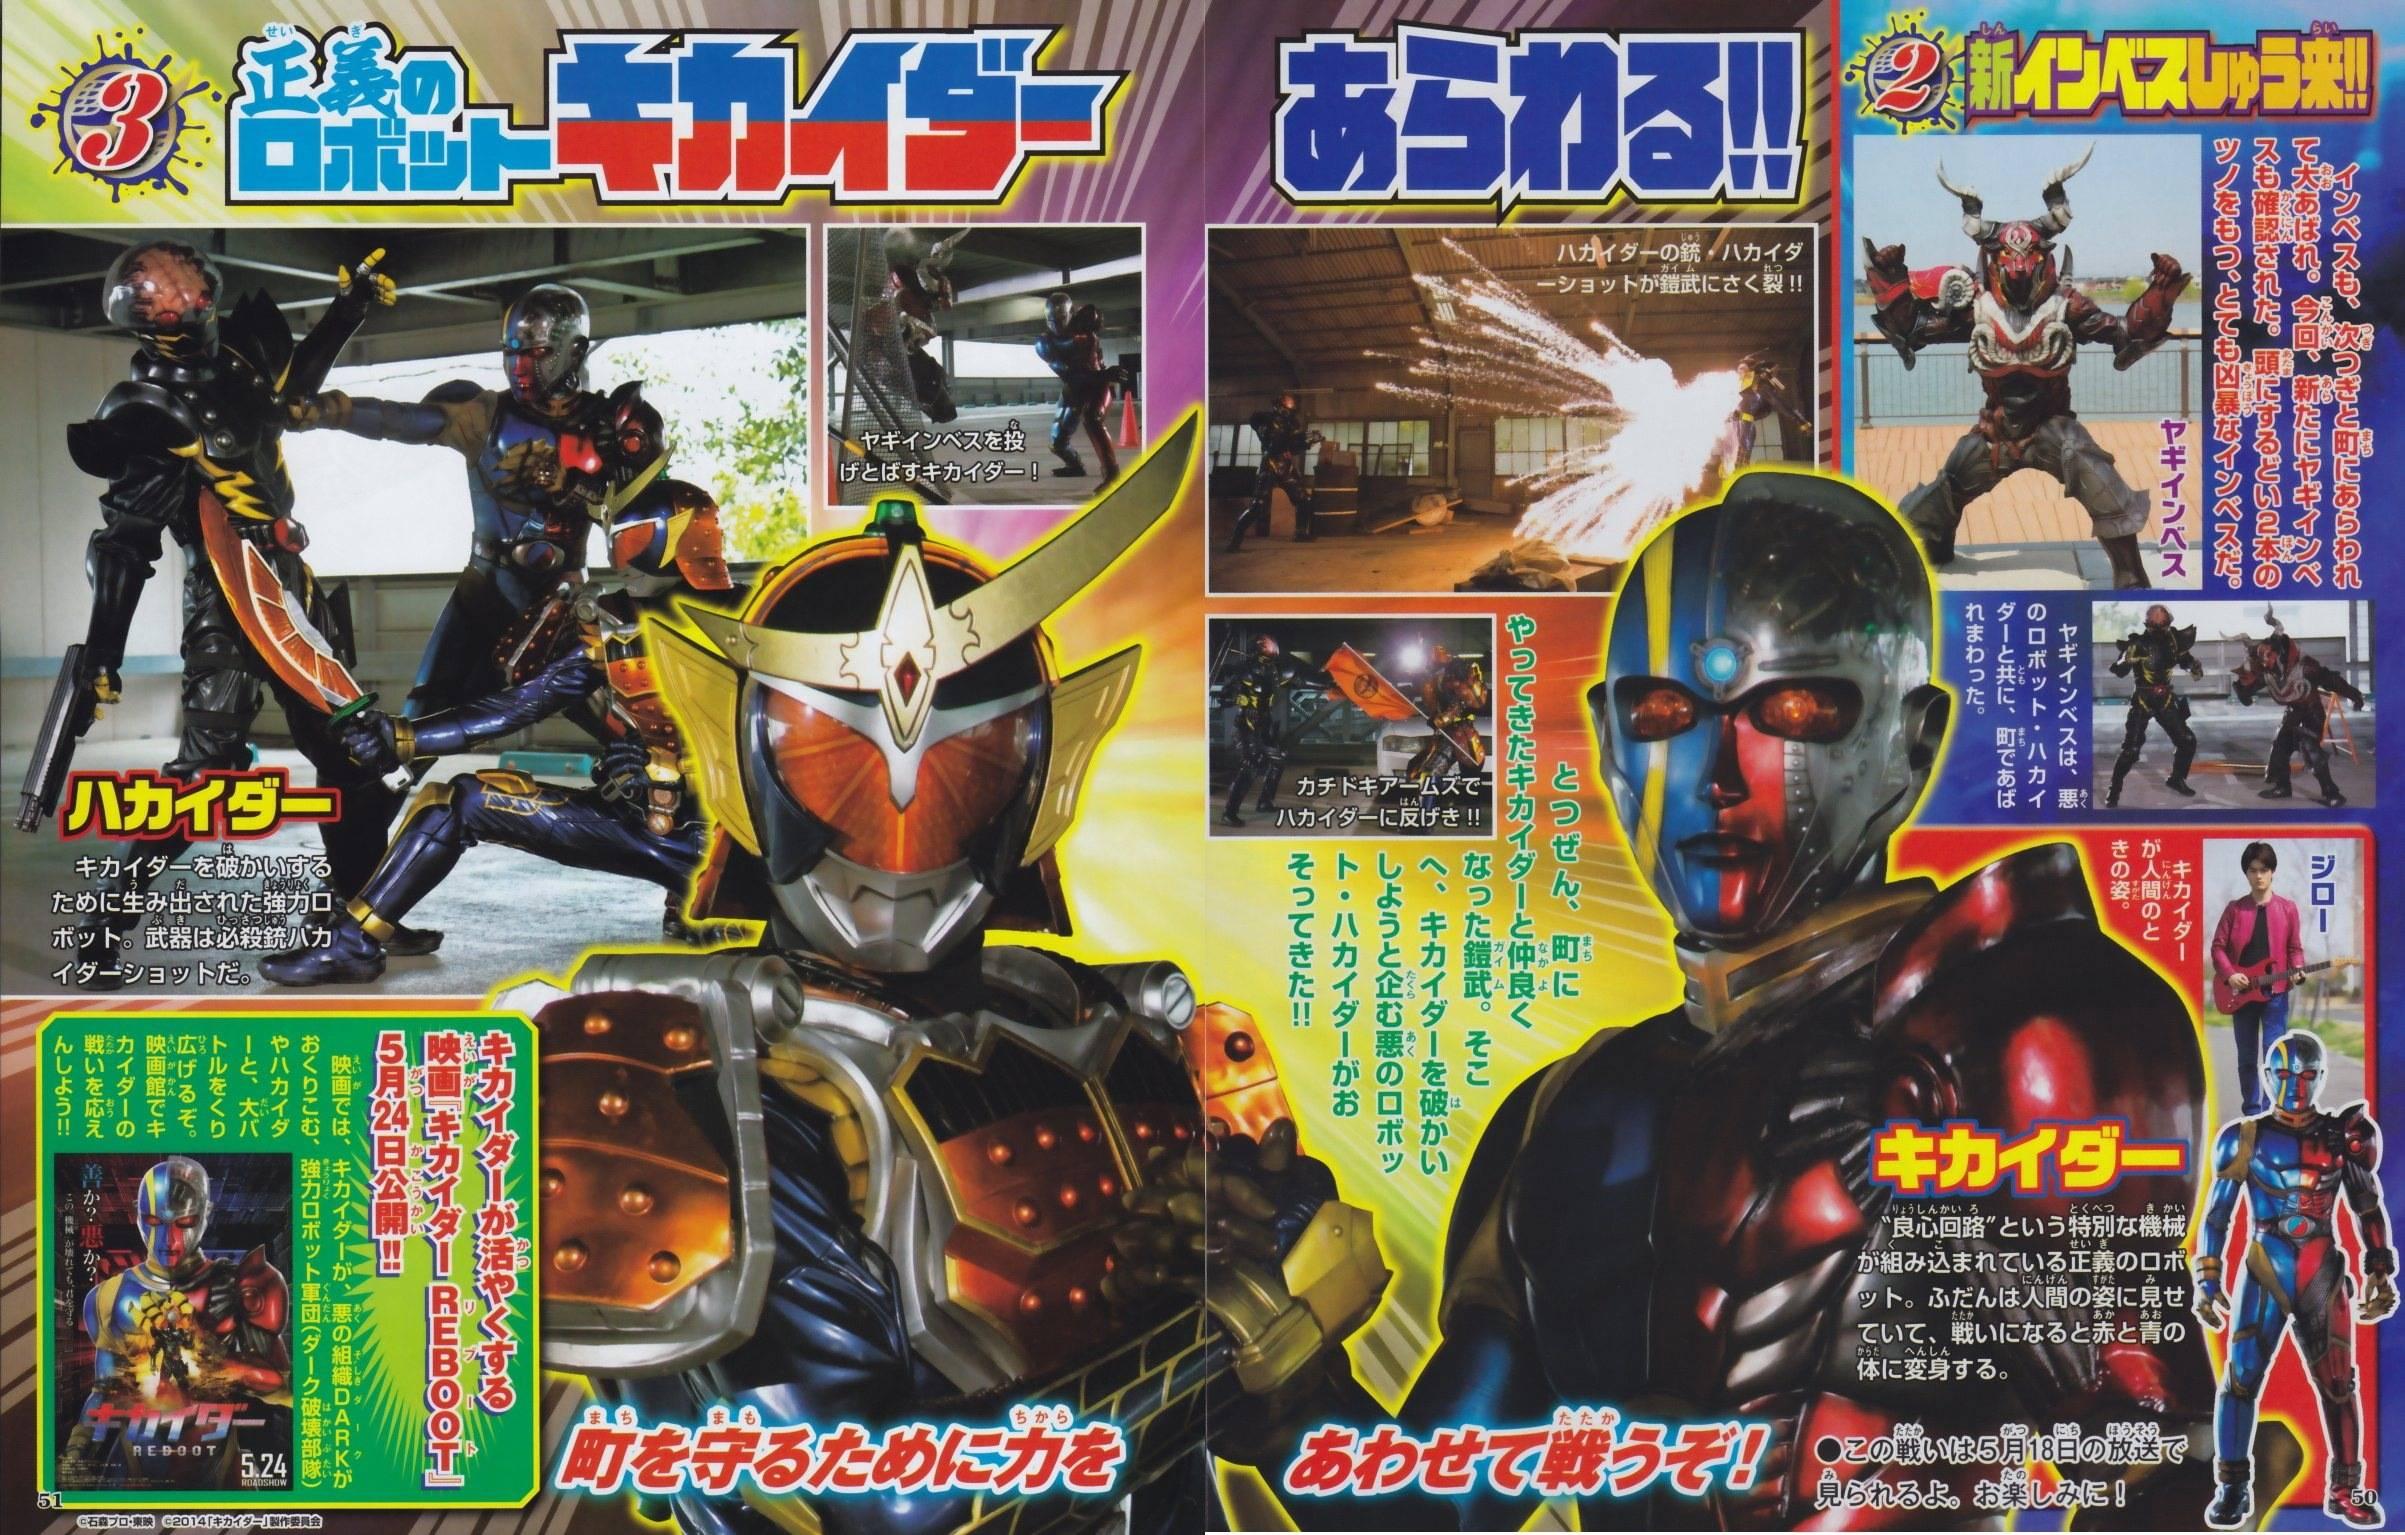 Kamen Rider Gaim and Kikaider Crossover Special Announced